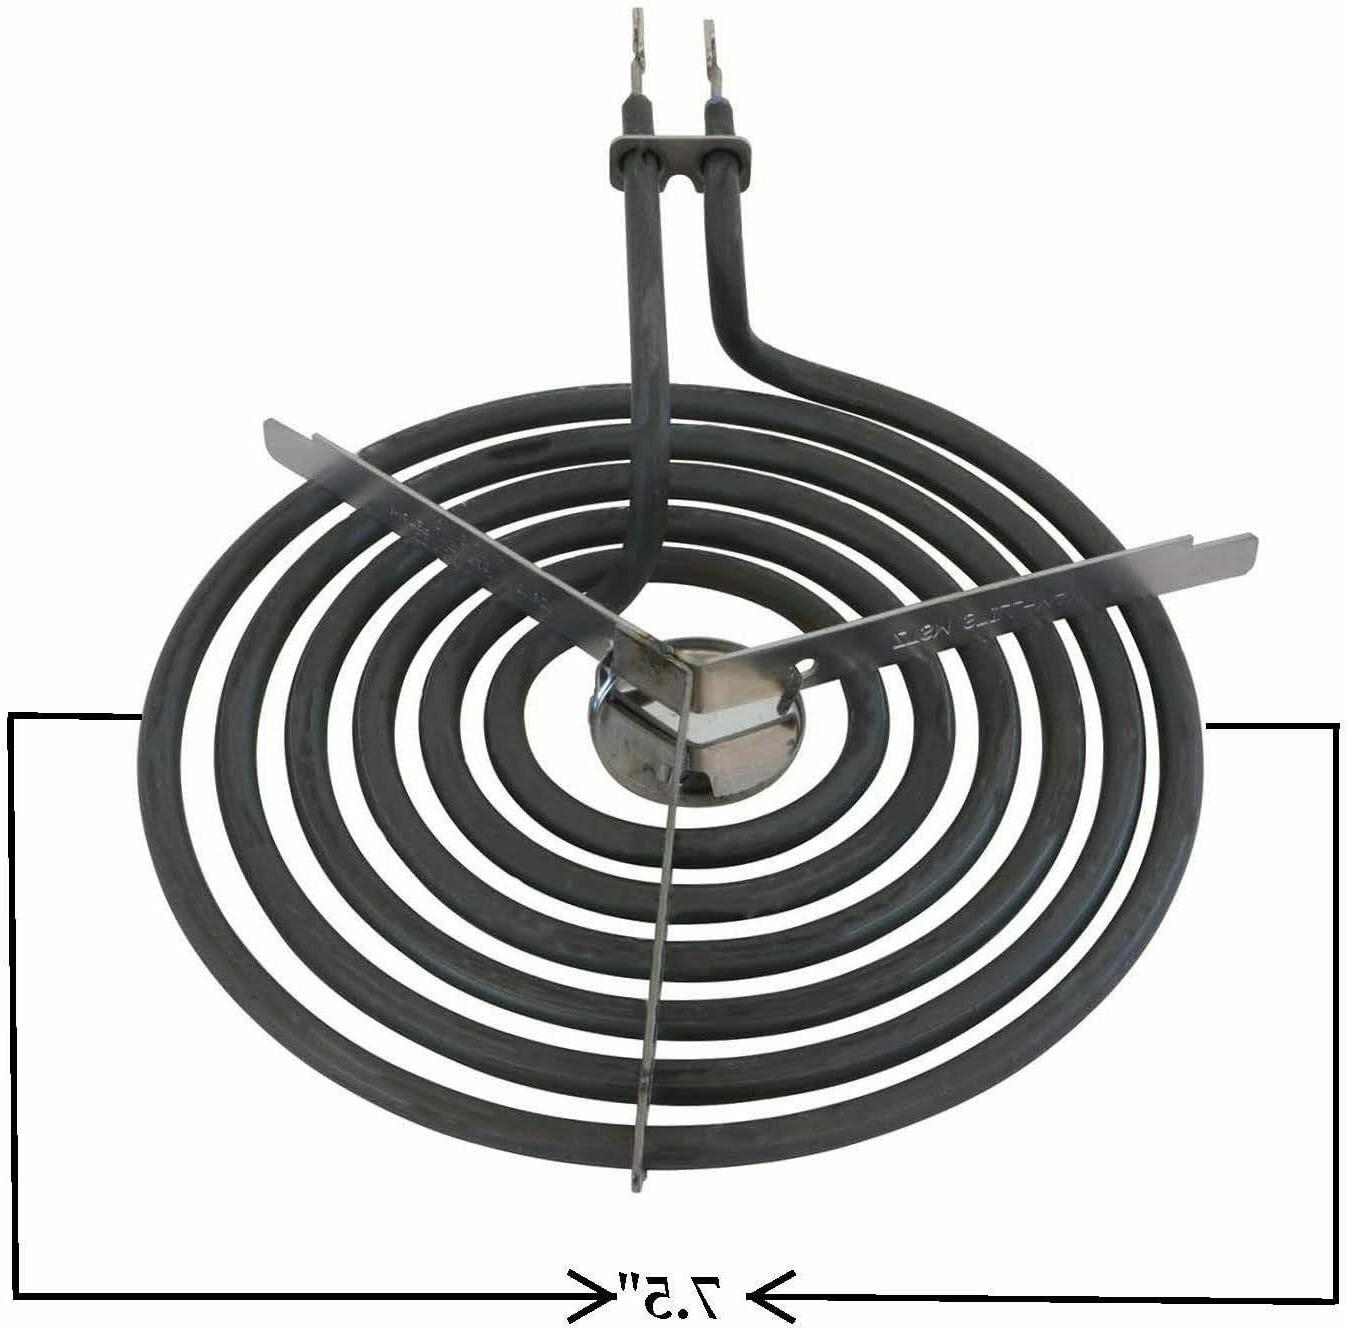 GE Range Burner Element Kit 4 WB30M1